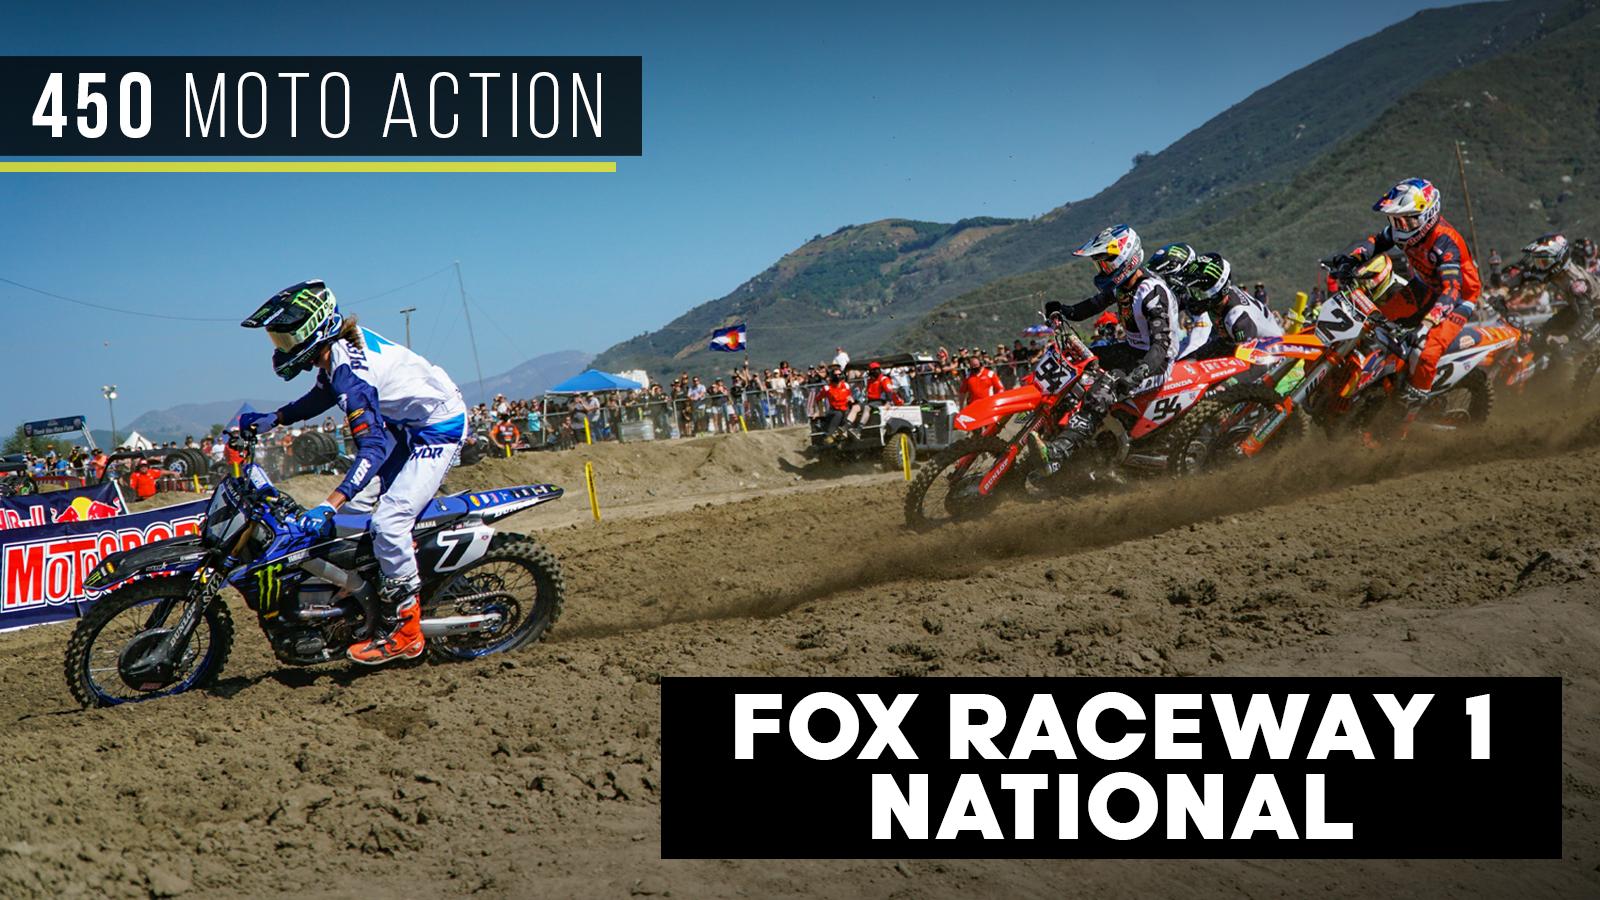 Fox Raceway 1 National   450 Moto Action